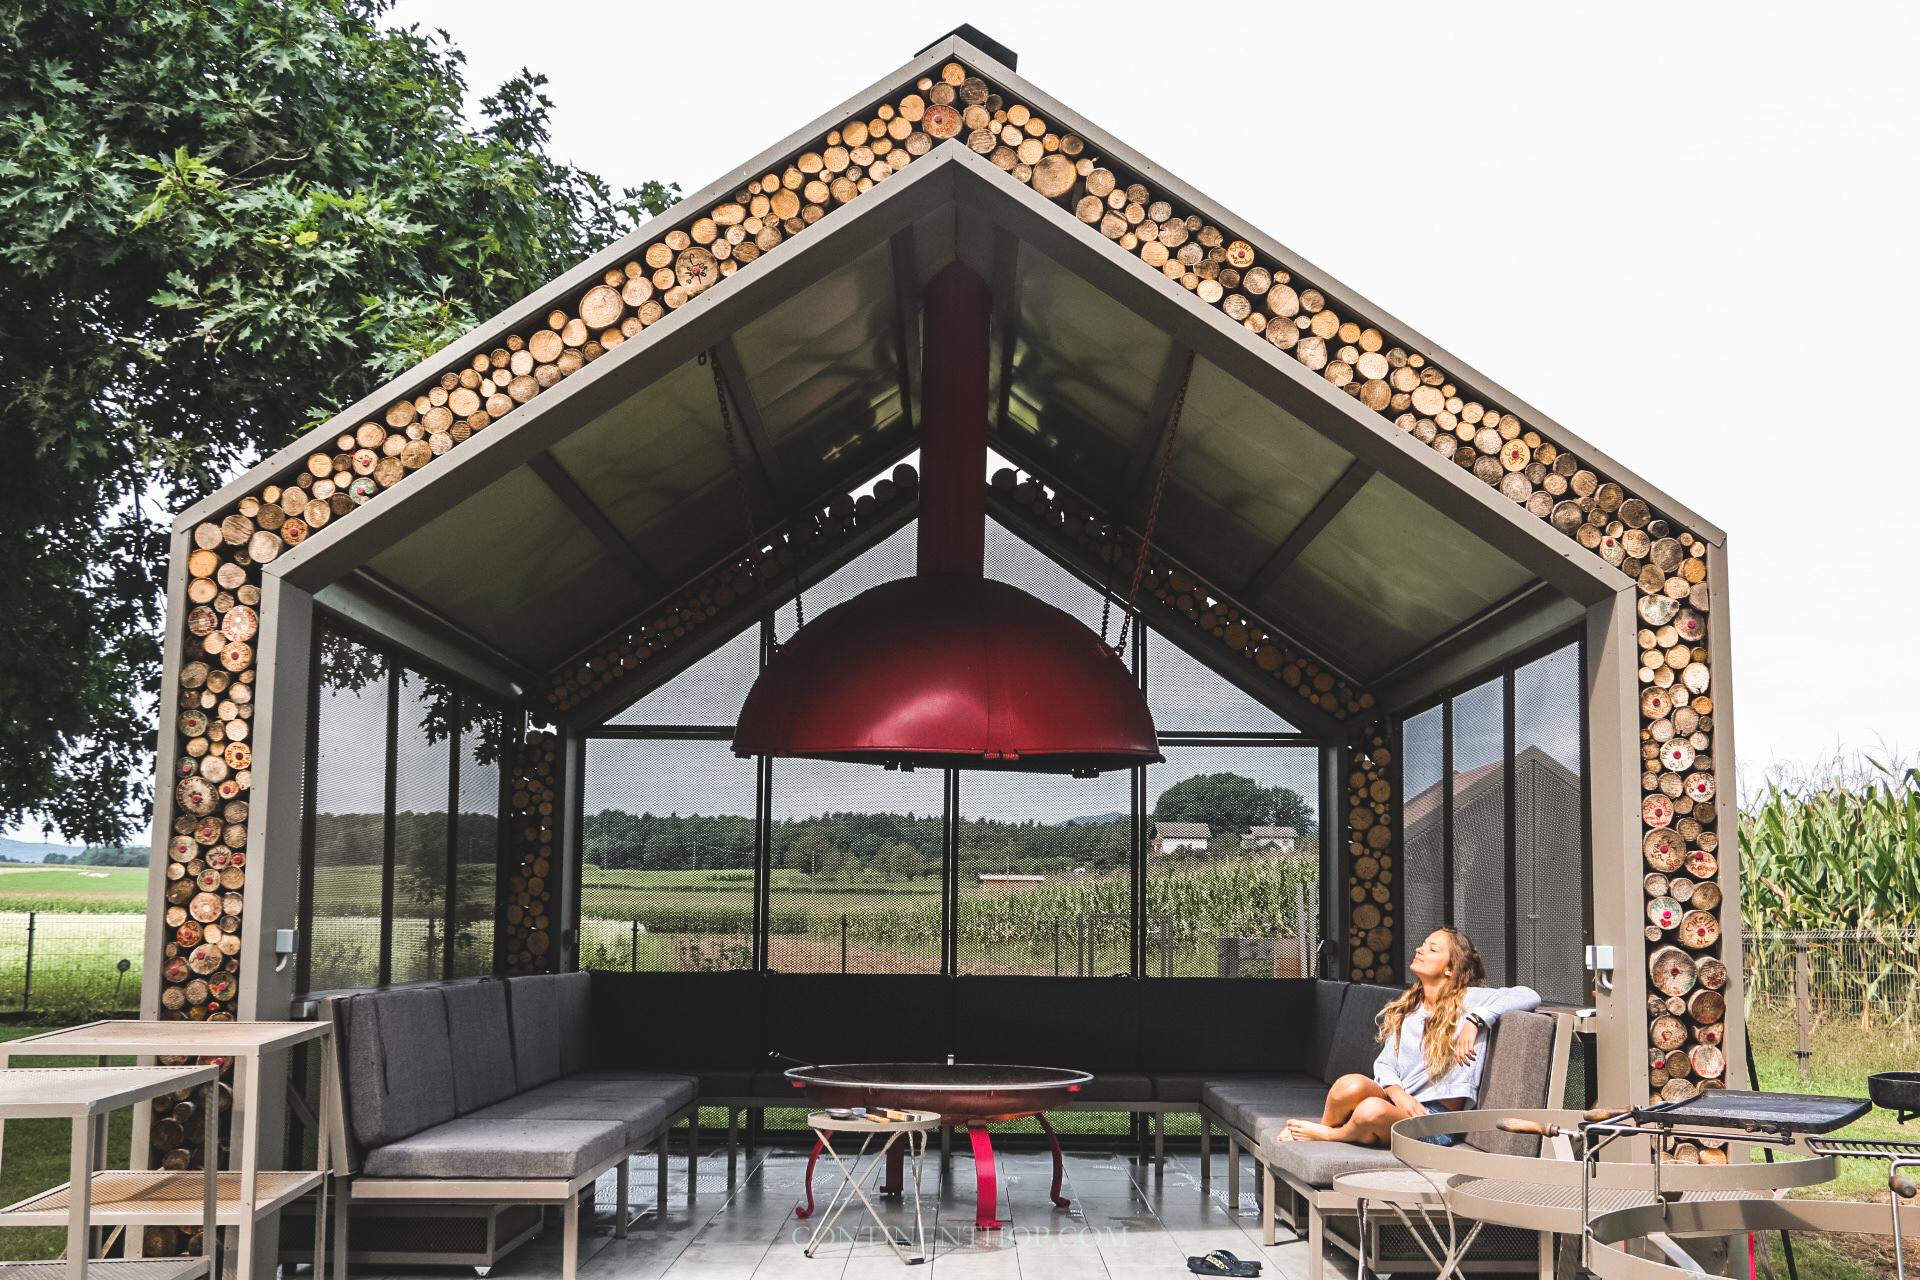 barbeque area at big berry luxury glamping resort in bela krajina slovenia